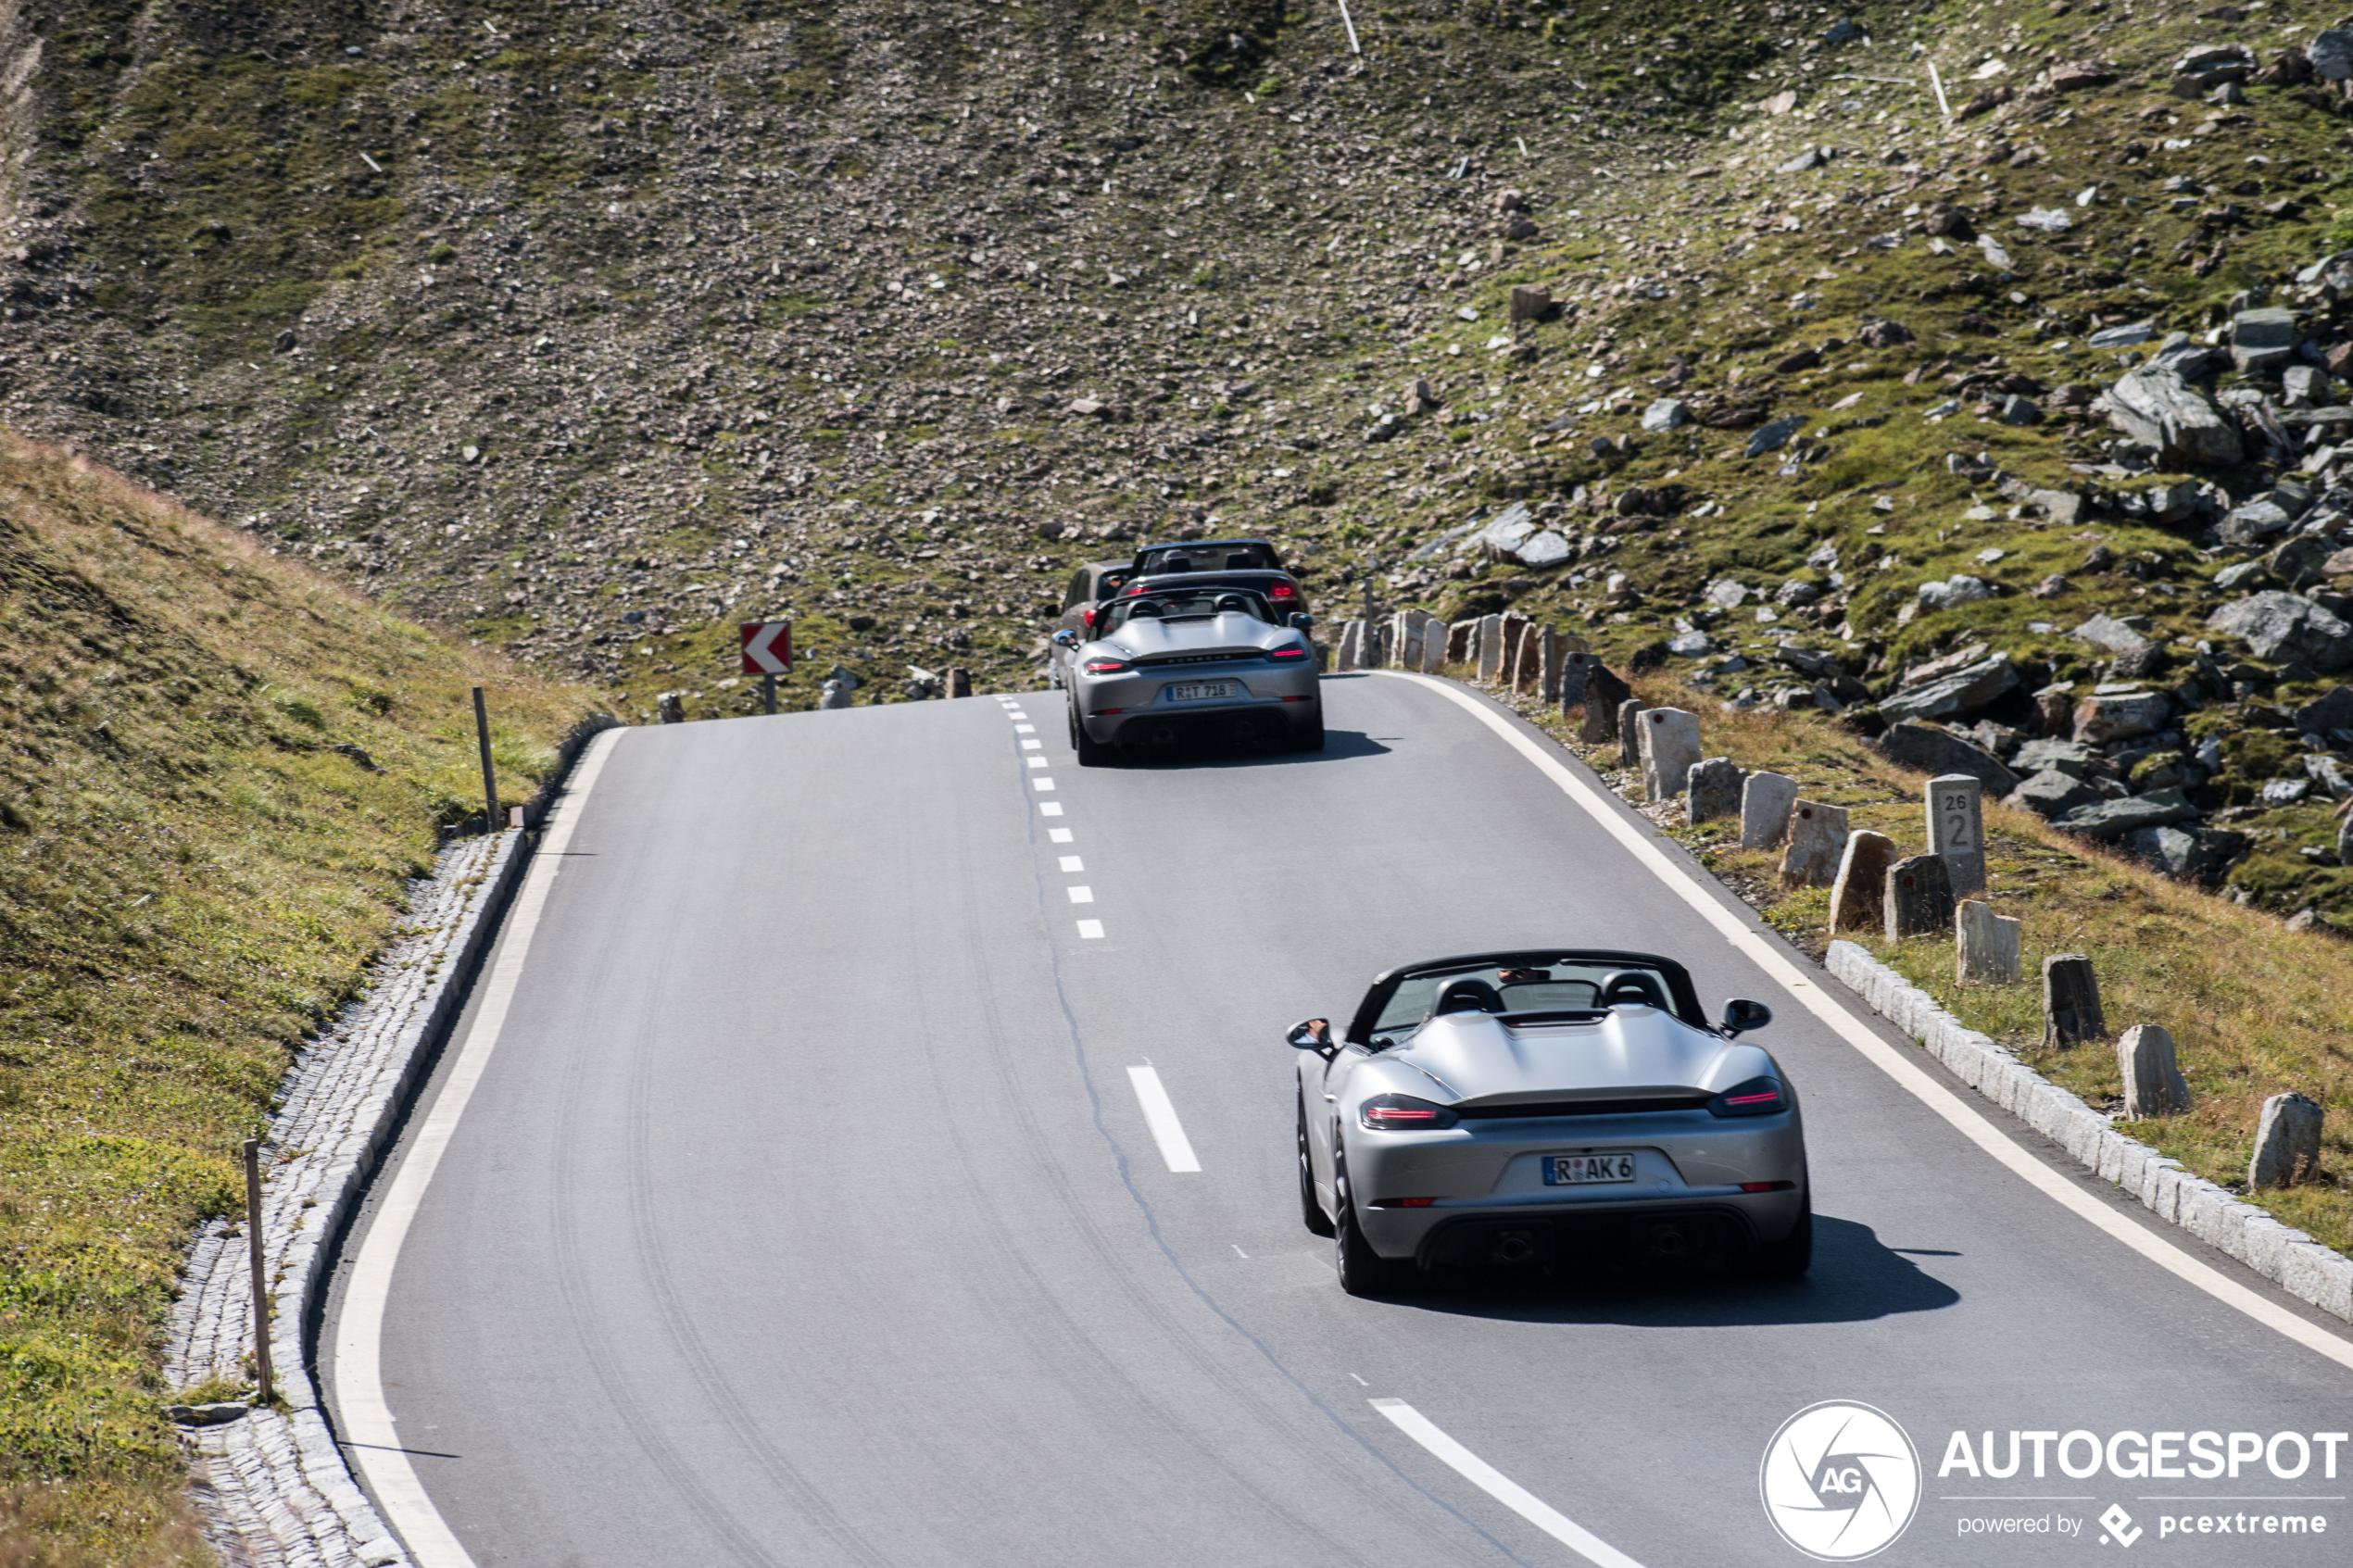 Porsche718 Boxster Spyder